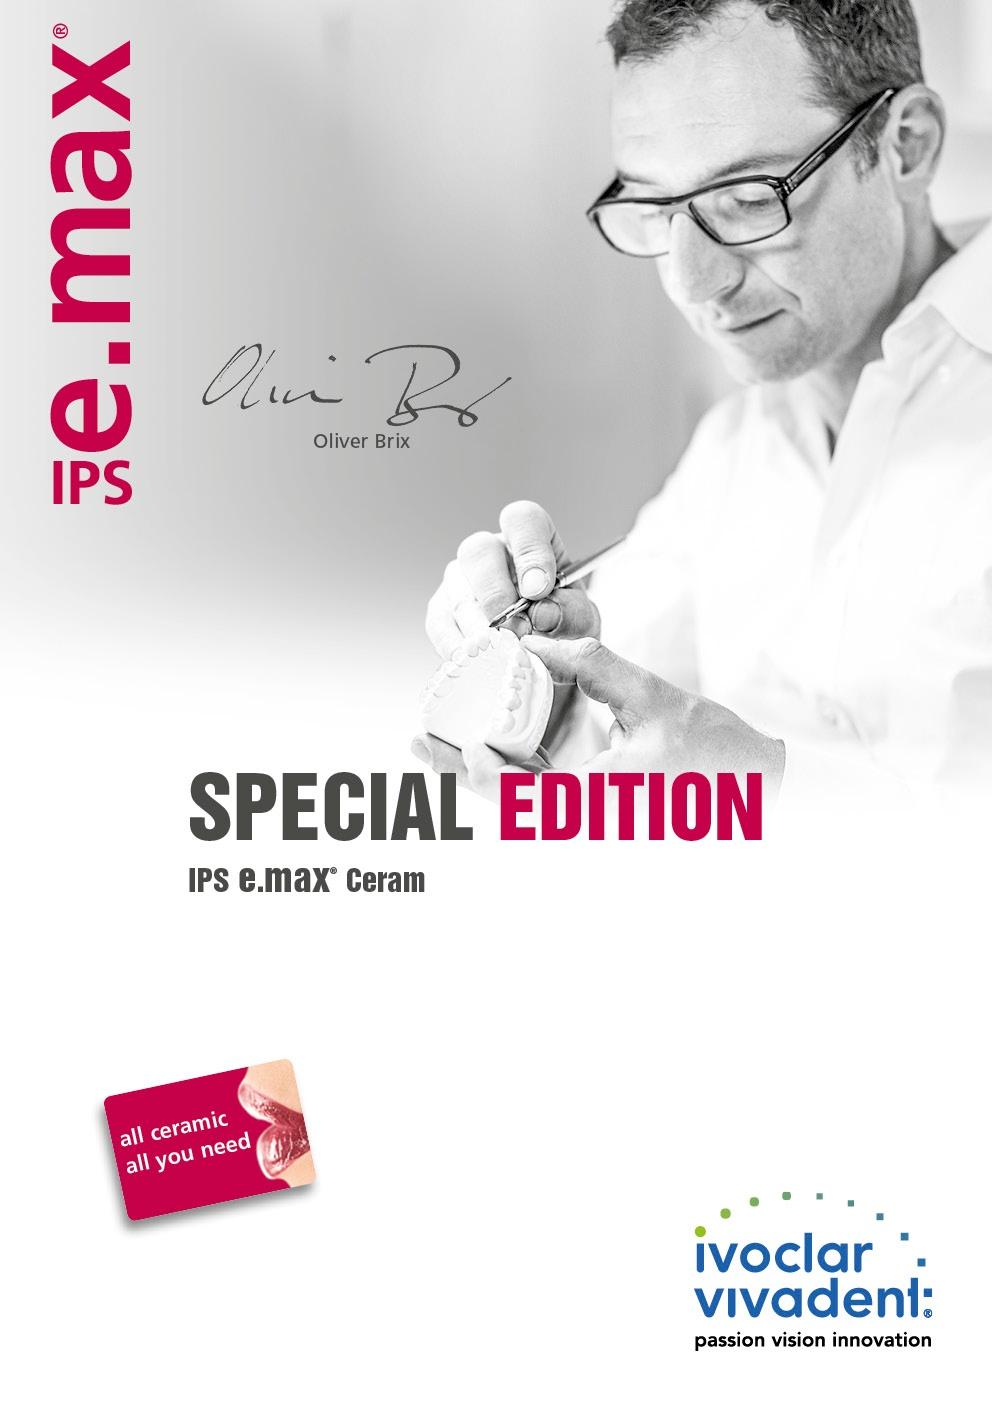 Special Edition Oliver Brix